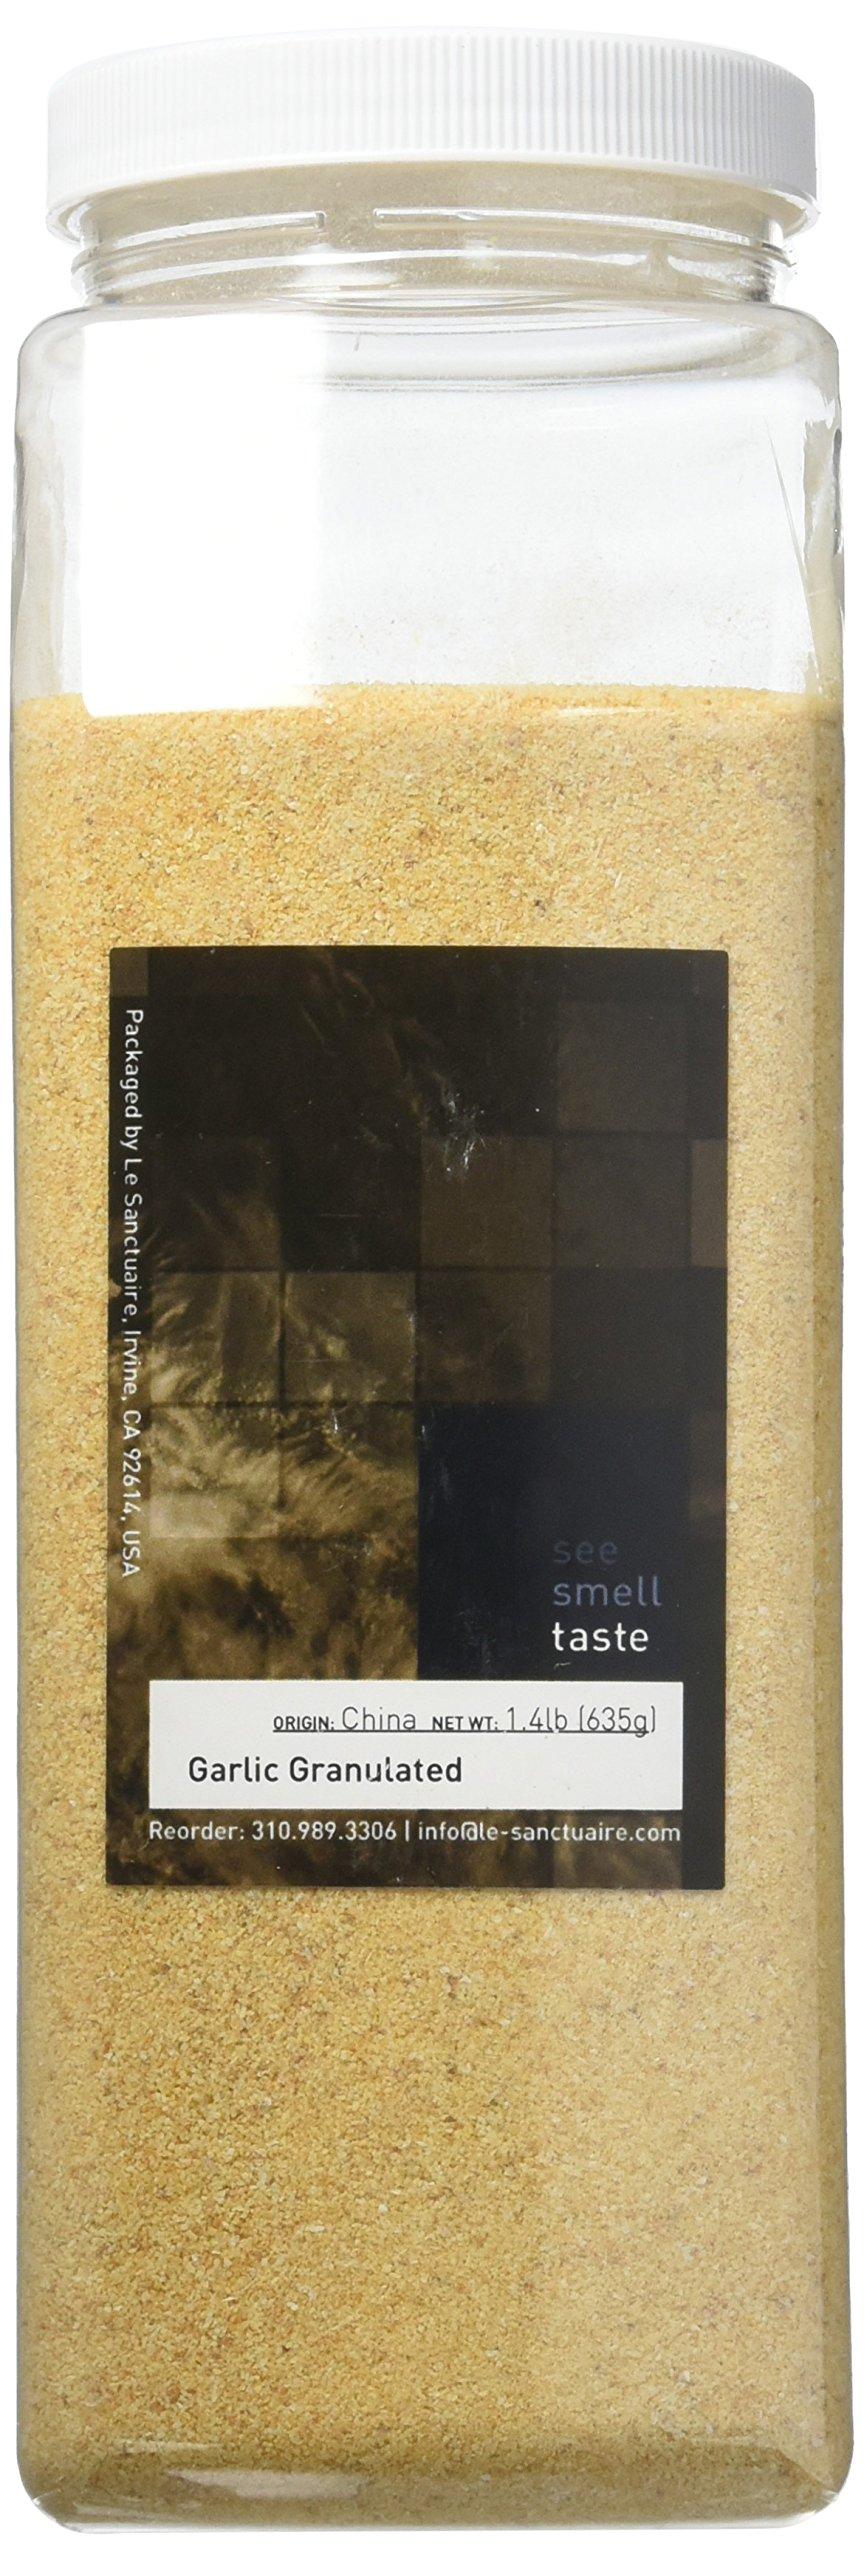 See Smell Taste Garlic Granulated, 1.4 Pound